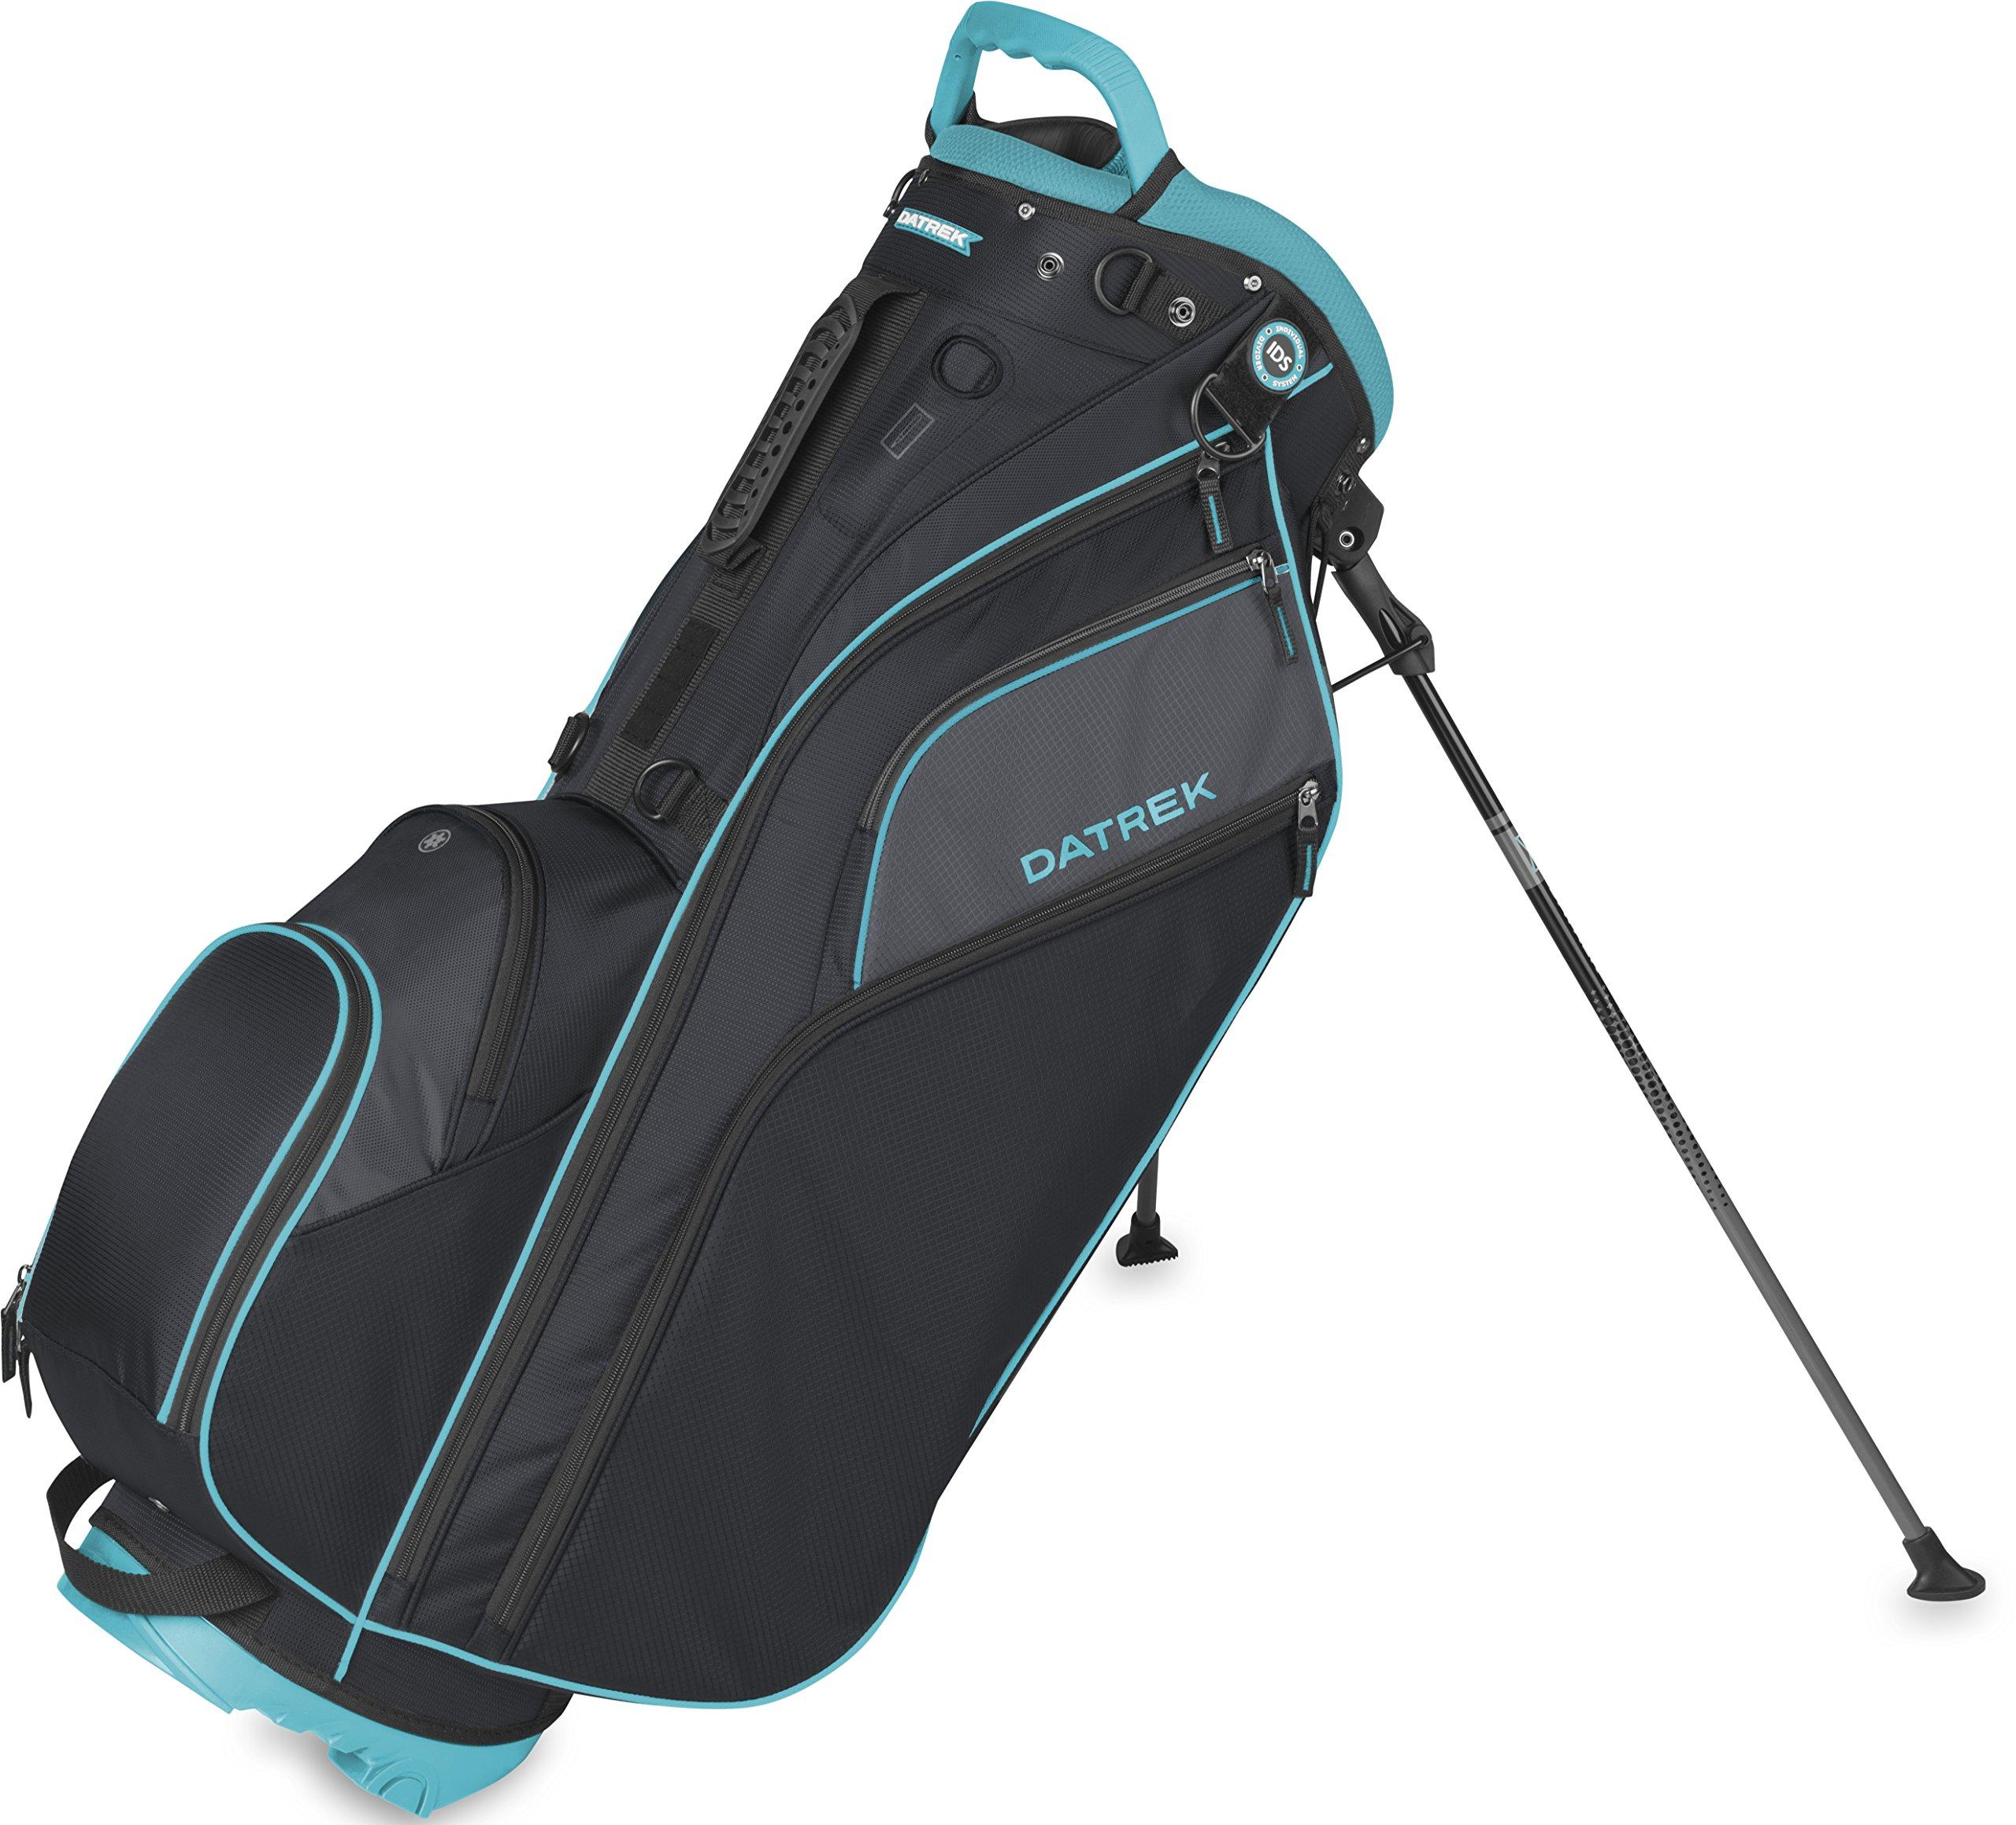 Datrek Golf Go Lite Hybrid Stand Bag (Black/Slate/Turquoise) by Datrek